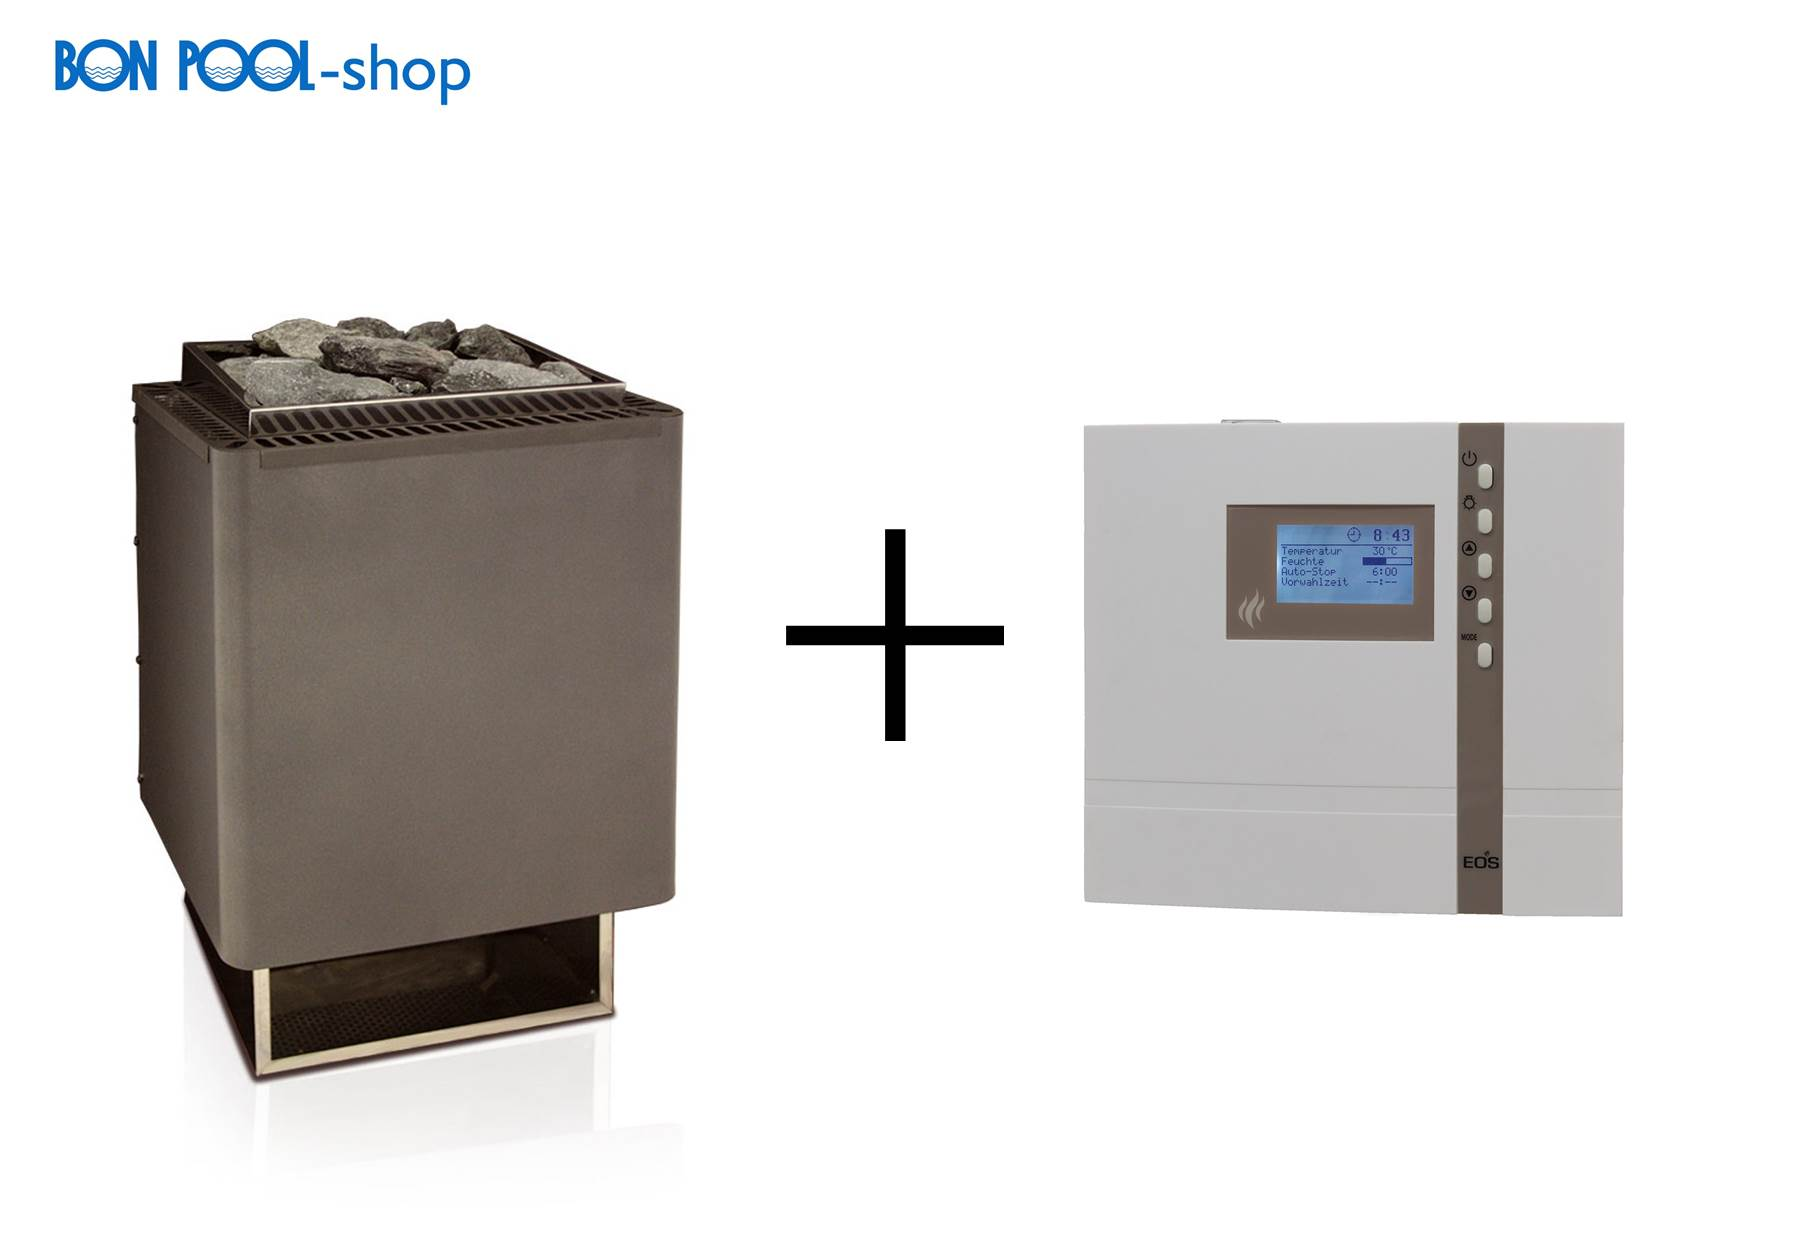 poolheizung xps 42 4 2 kw w rmepumpe aqualux 13 5 kw f r. Black Bedroom Furniture Sets. Home Design Ideas